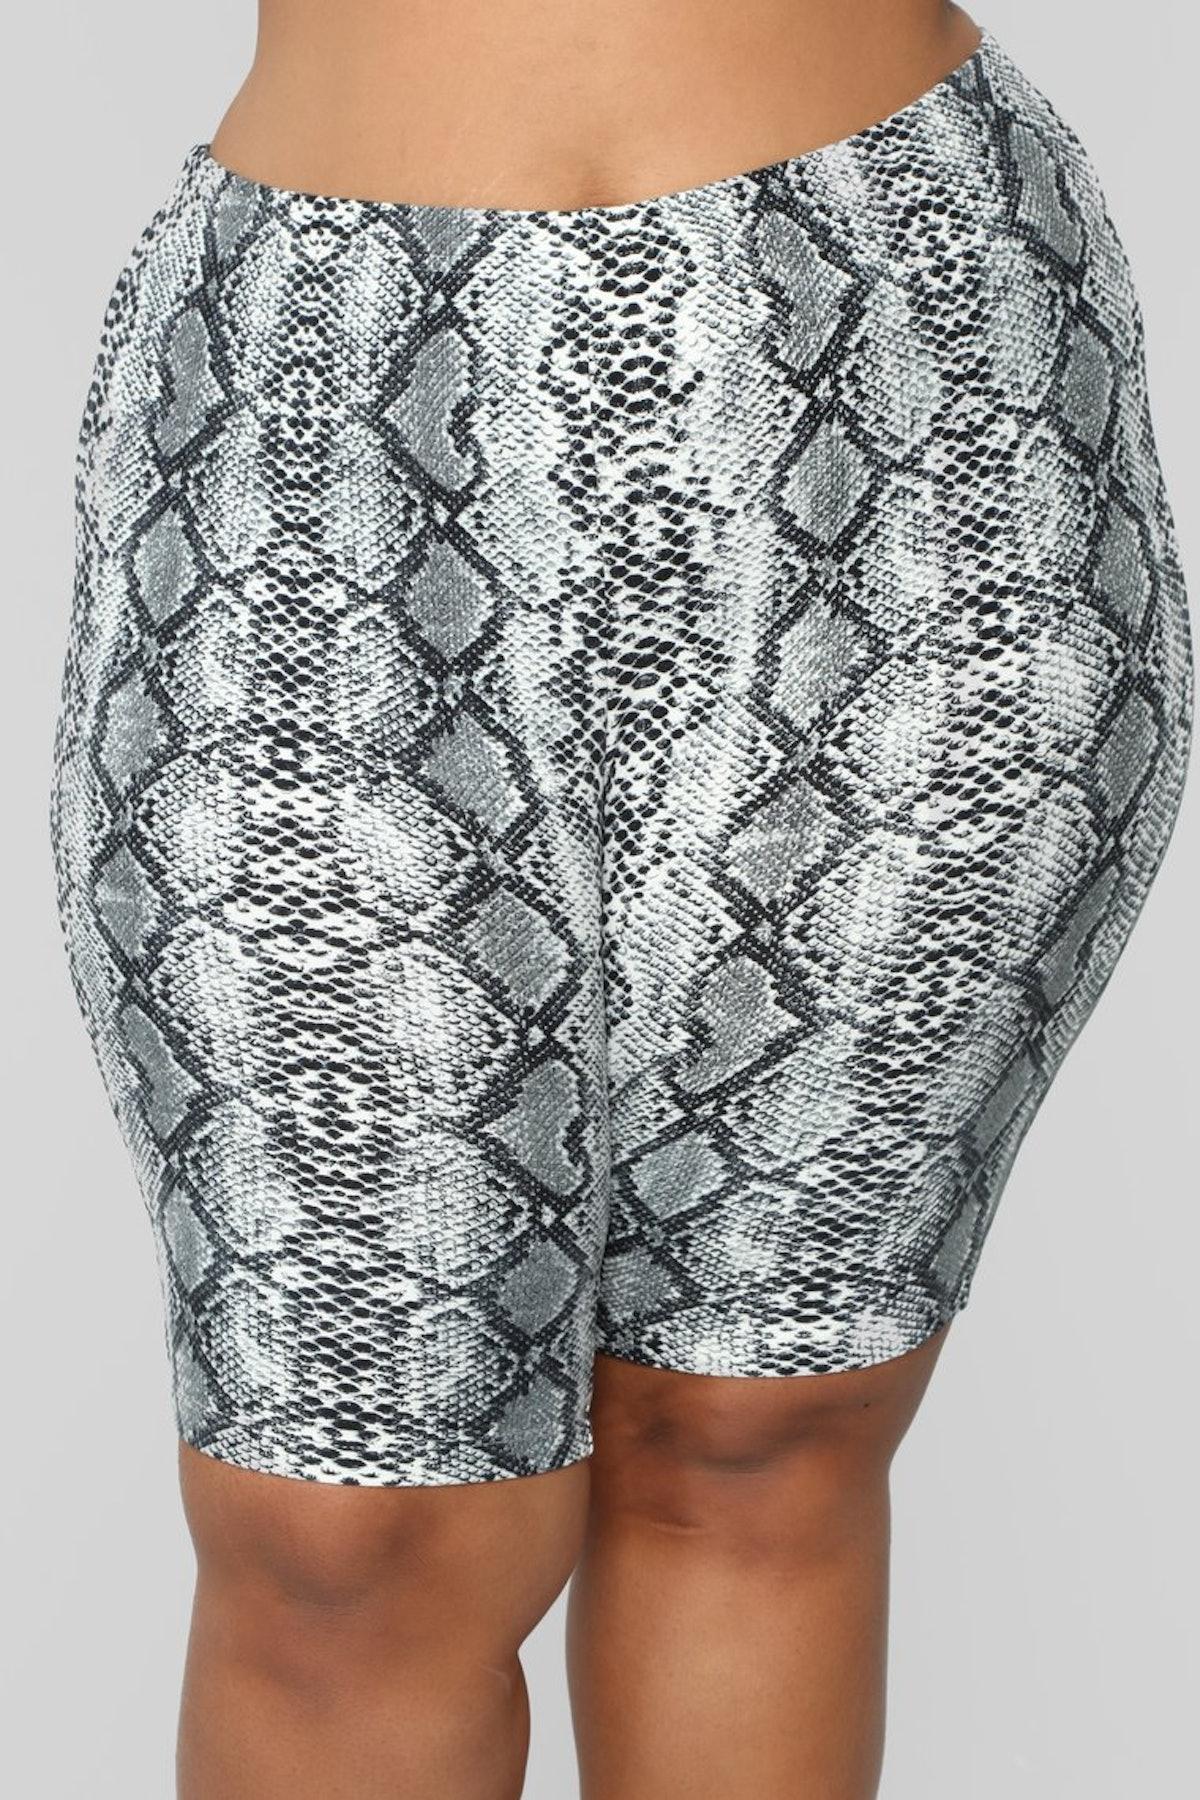 Medusa Snake Print Biker Shorts - Grey